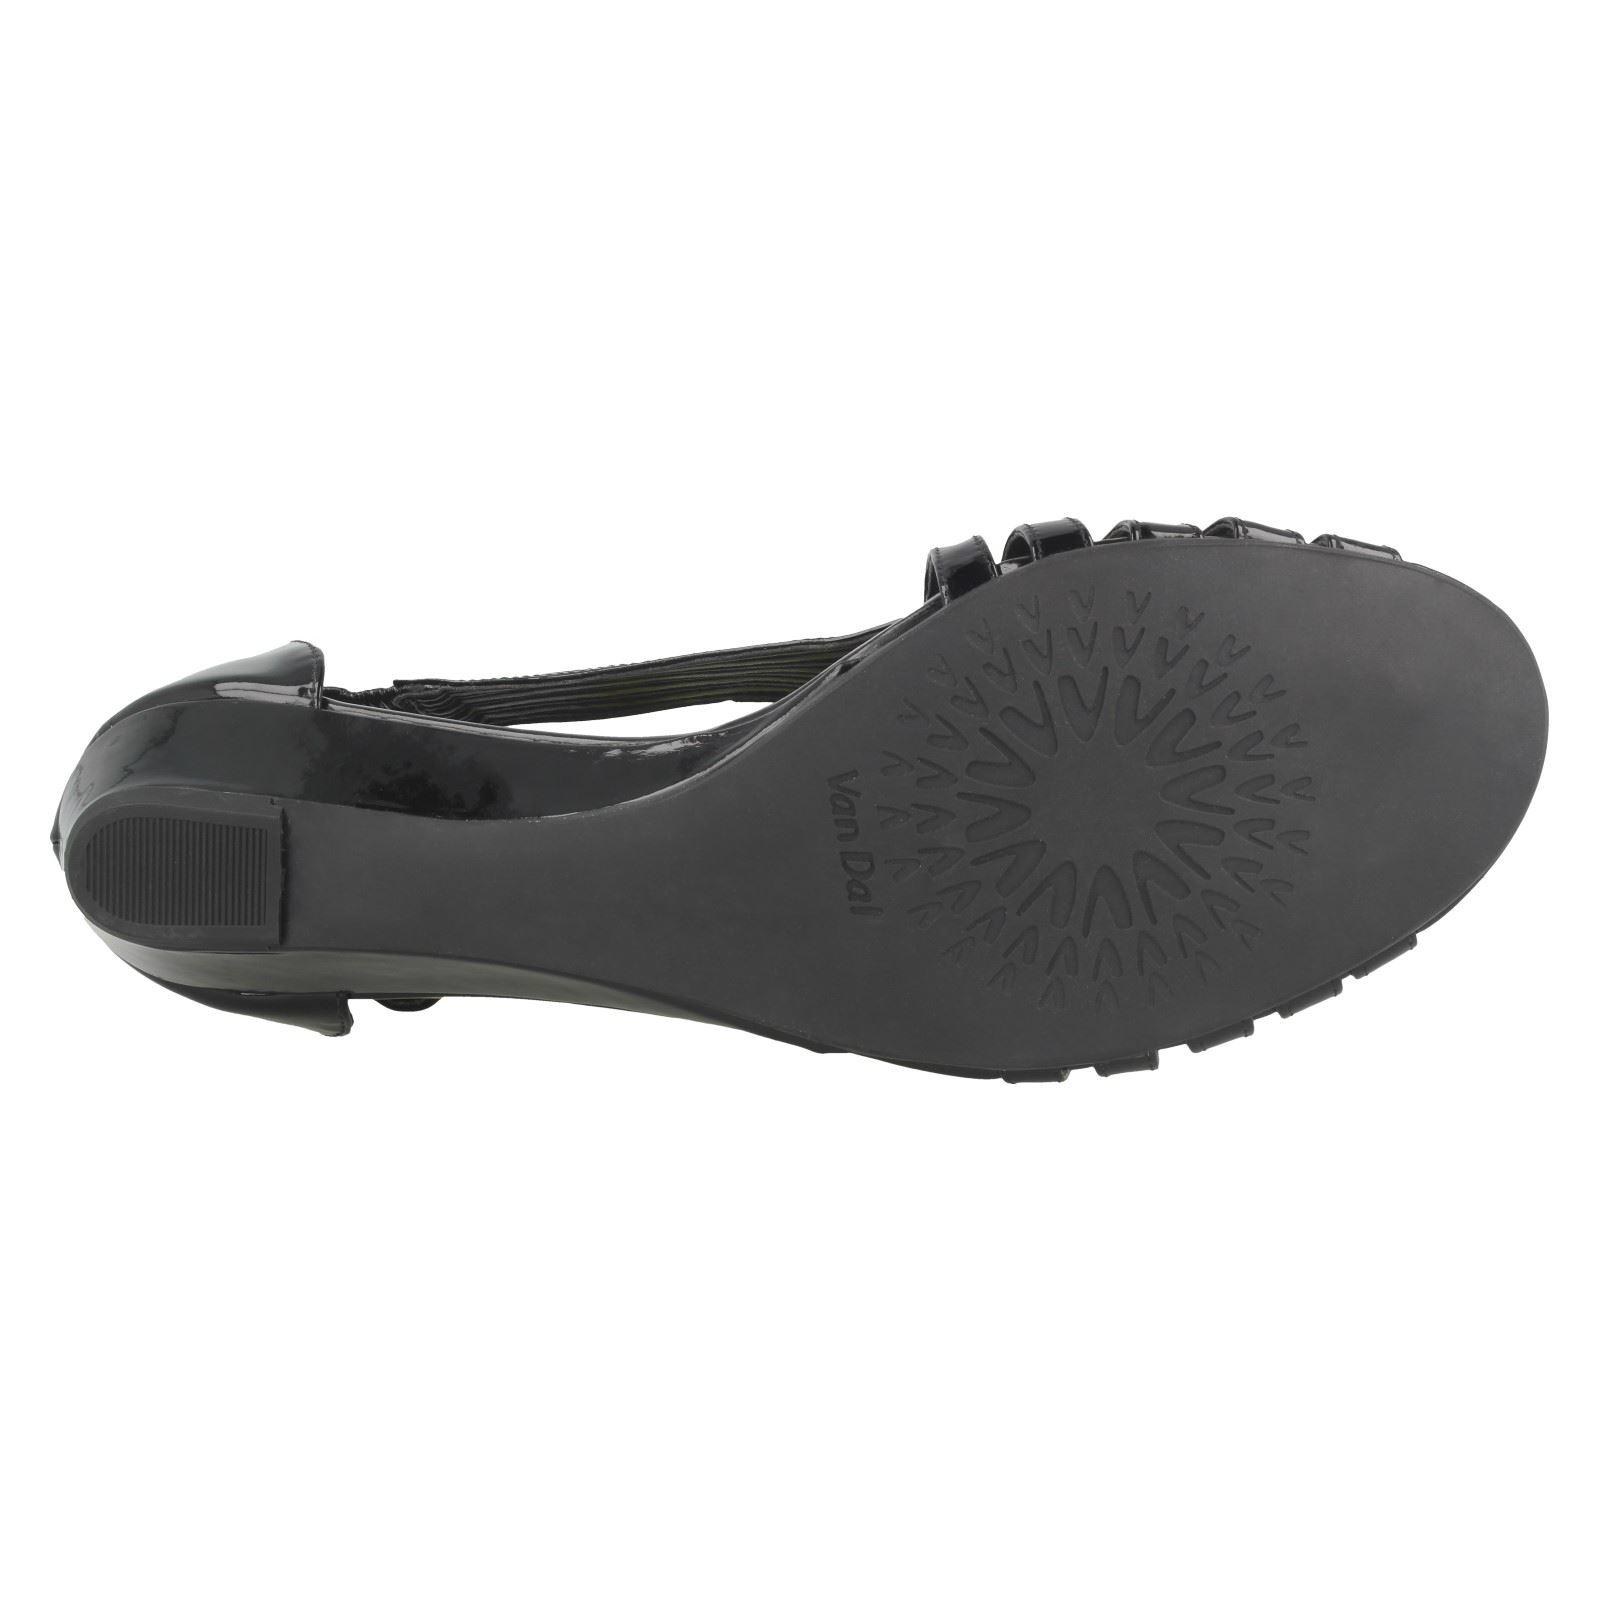 Ladies-Van-Dal-Wedge-Strappy-Sandals-Lucie thumbnail 5